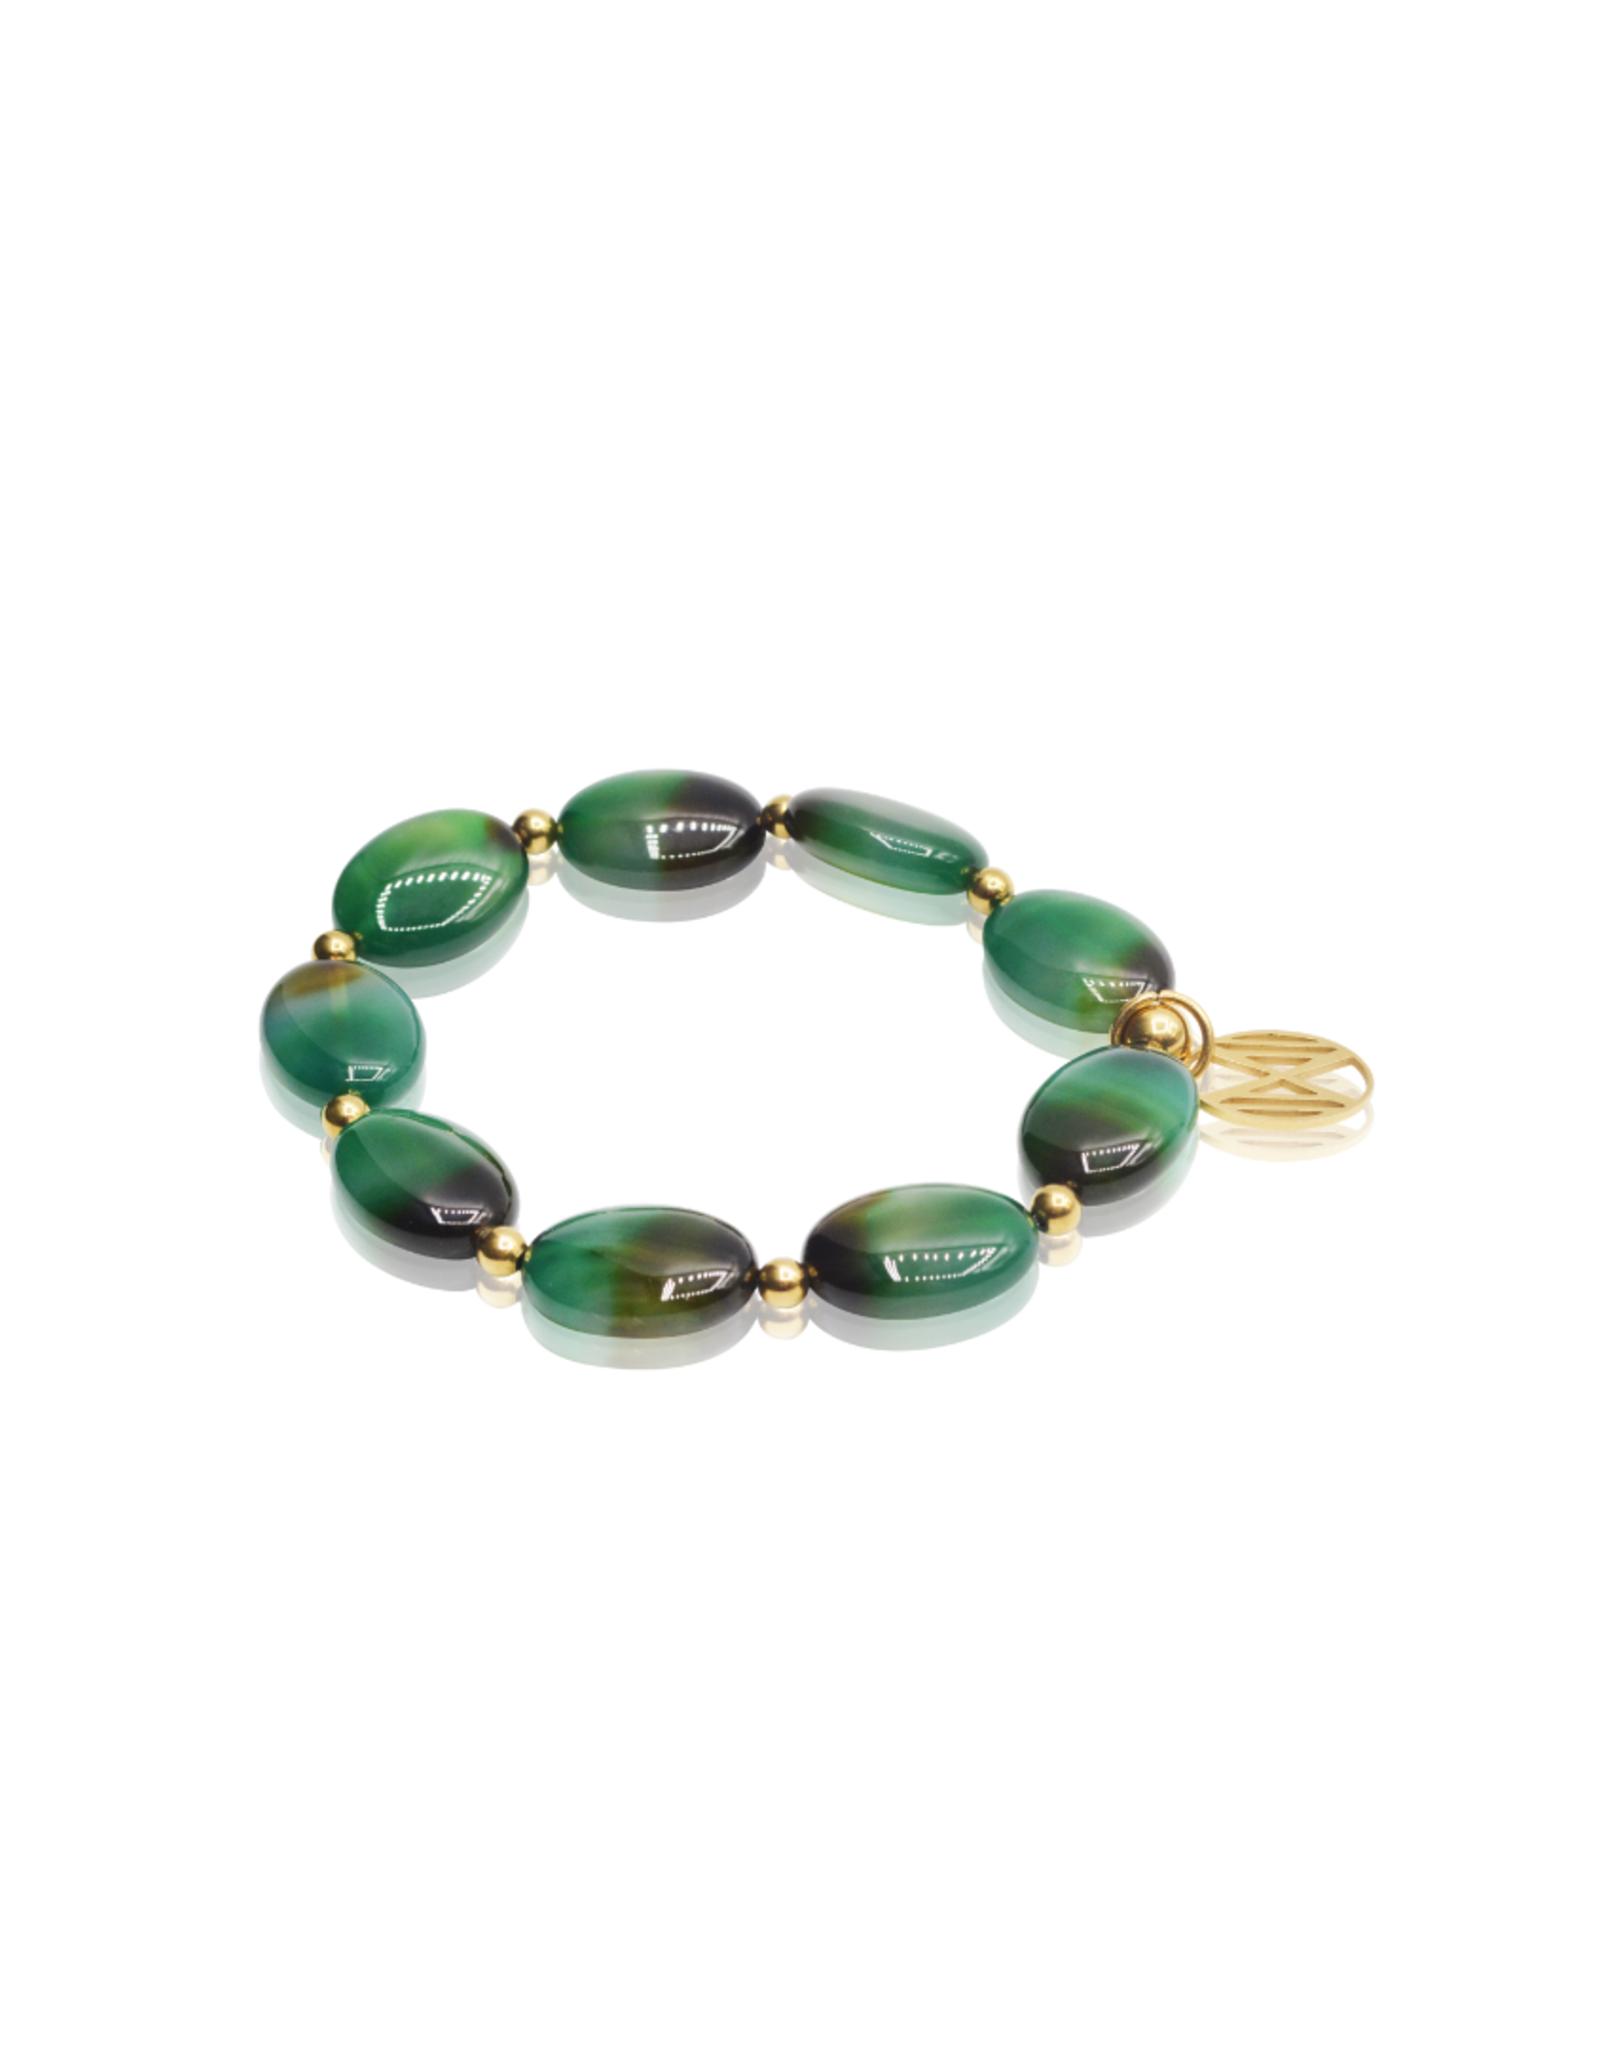 Emerald, Ovale, groenbruine agaat